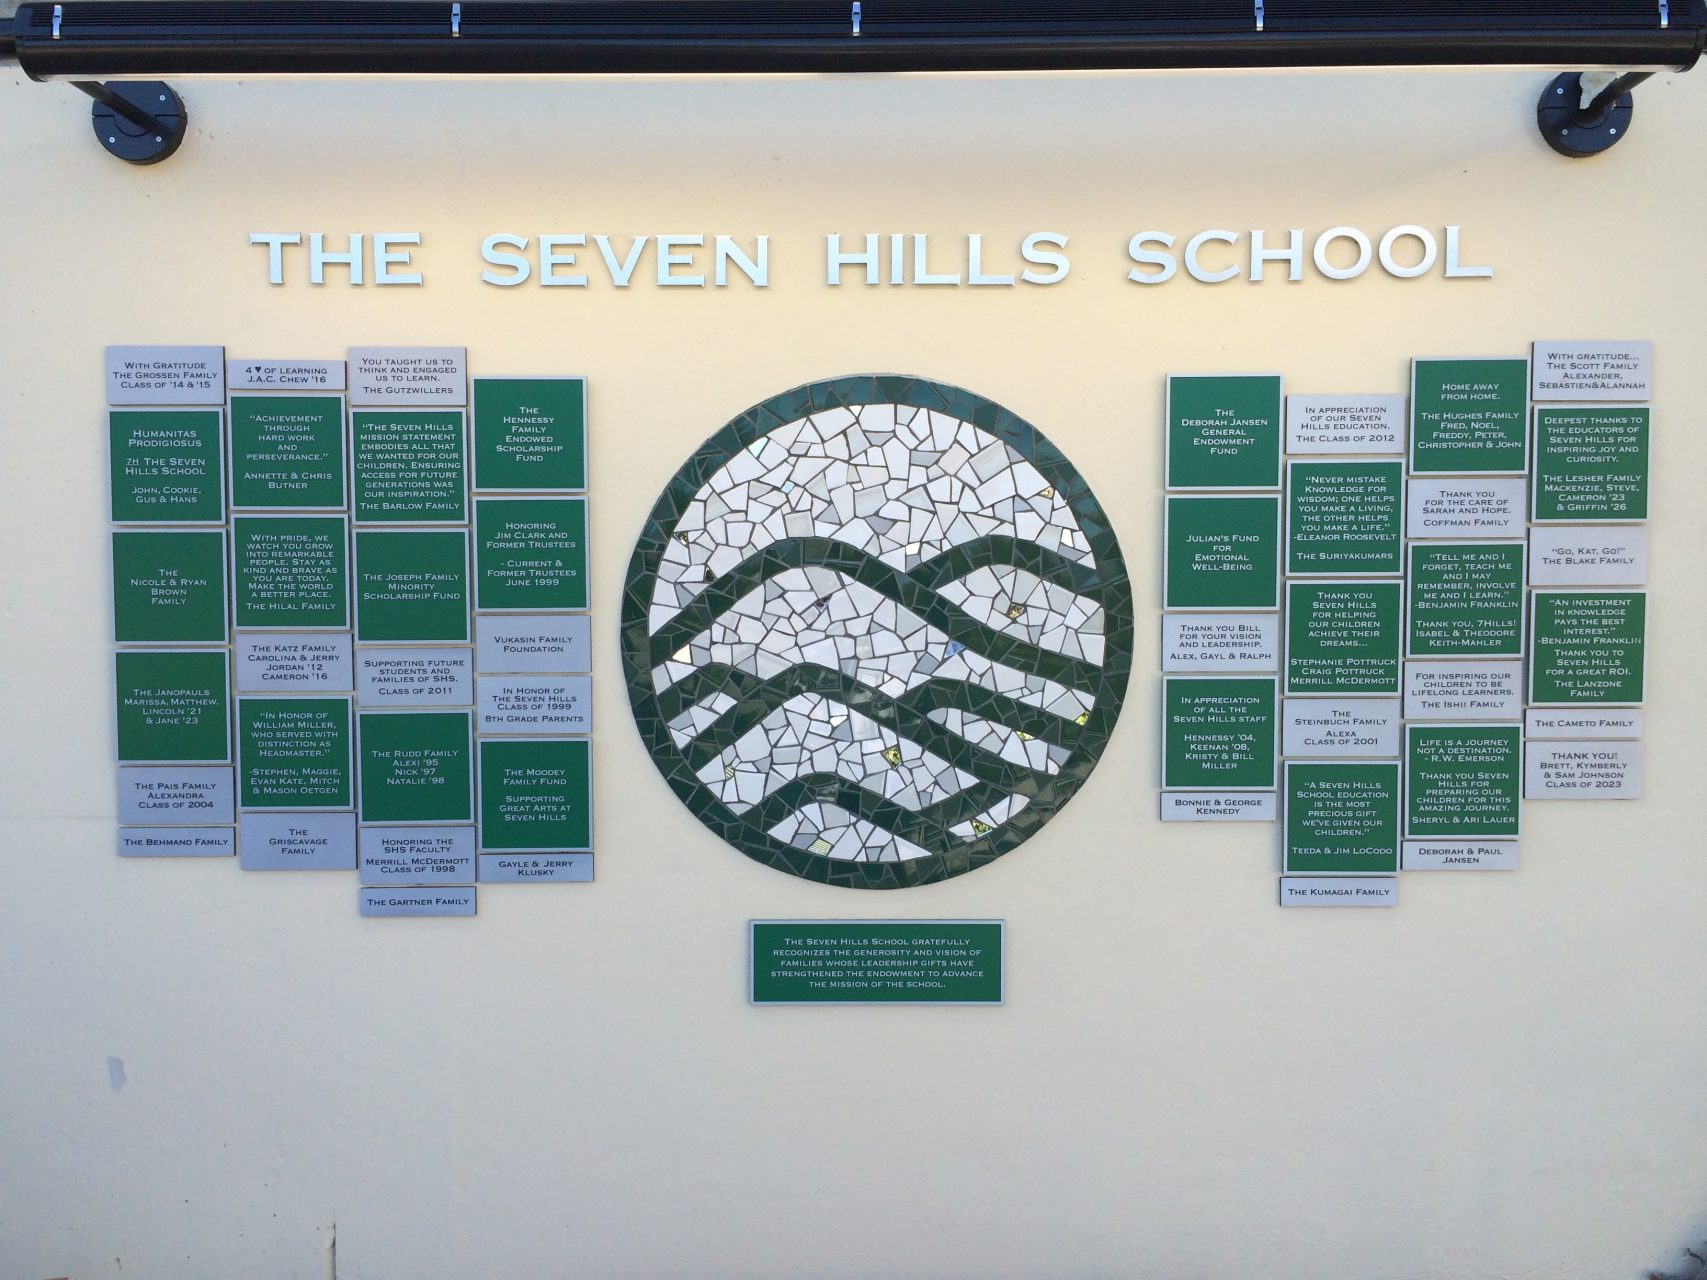 School Environmental Signage - Sequoia Signs Walnut Creek